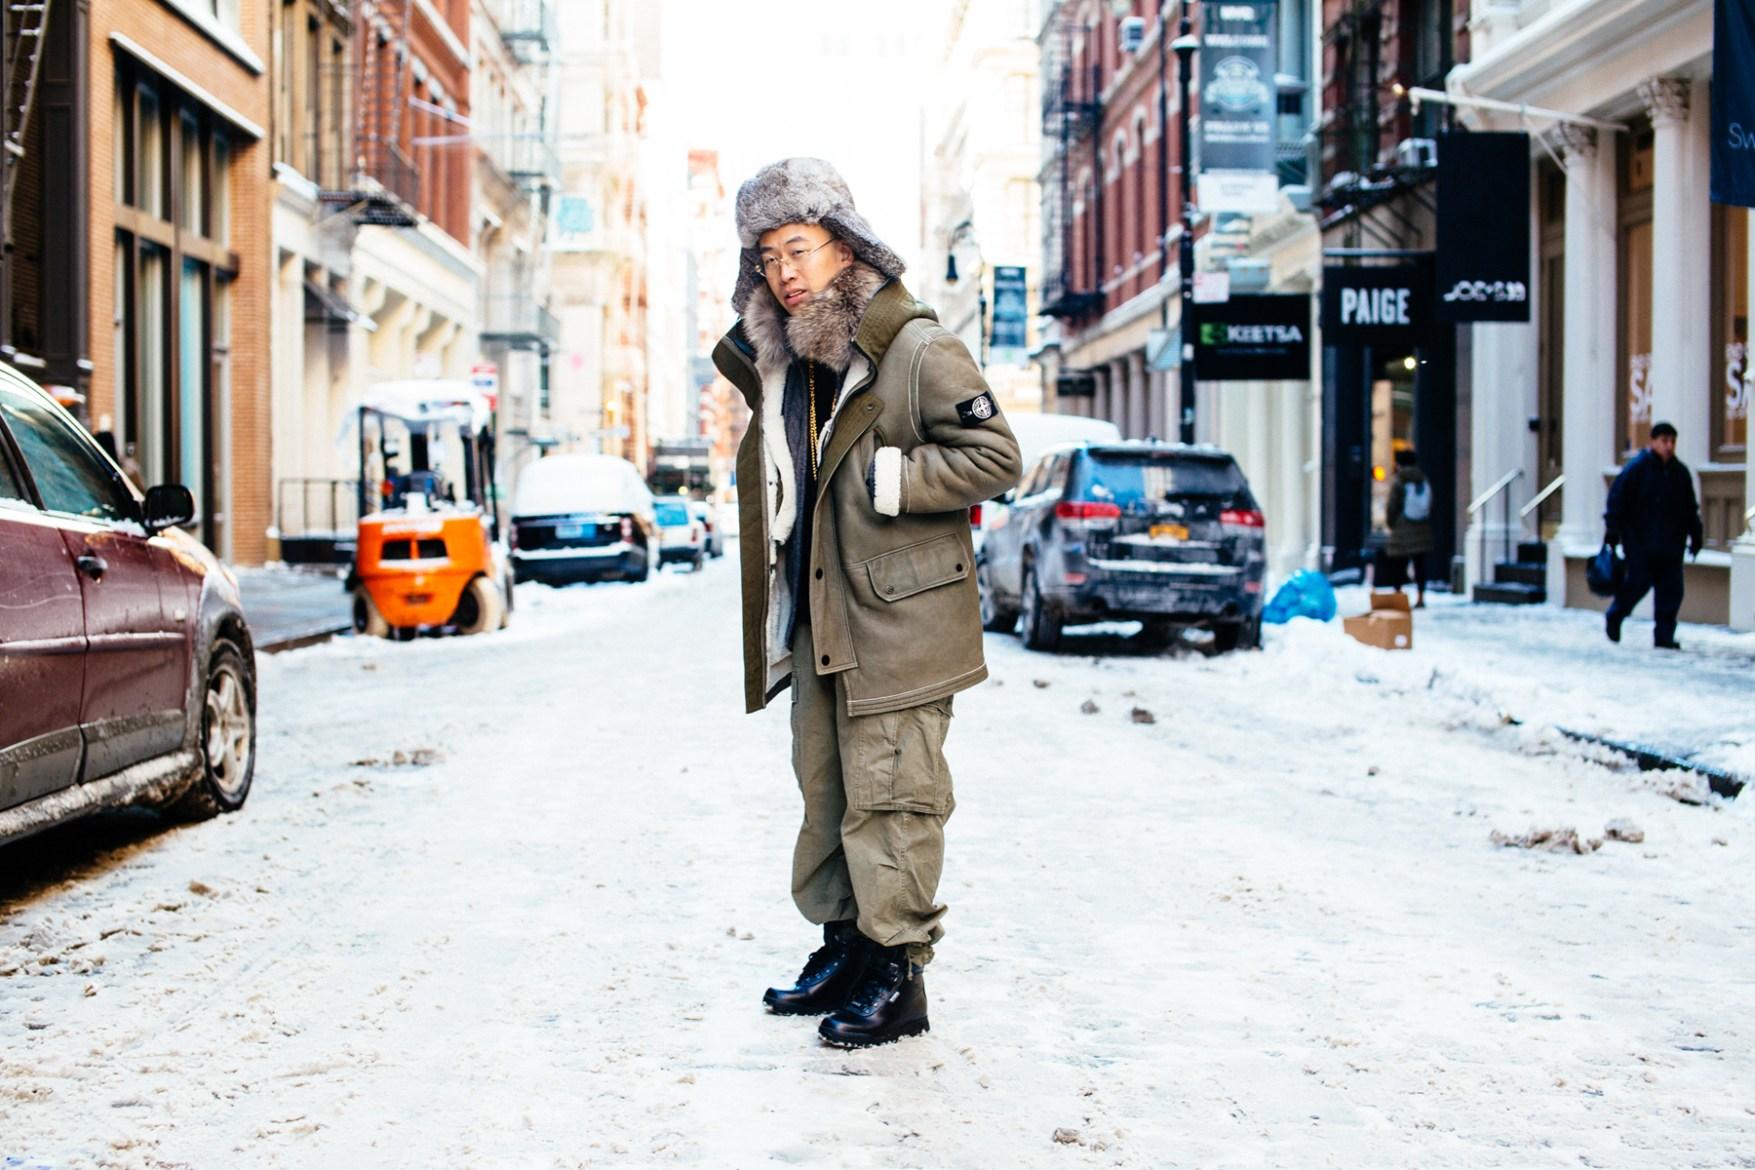 Streetsnaps: Kevin Leong